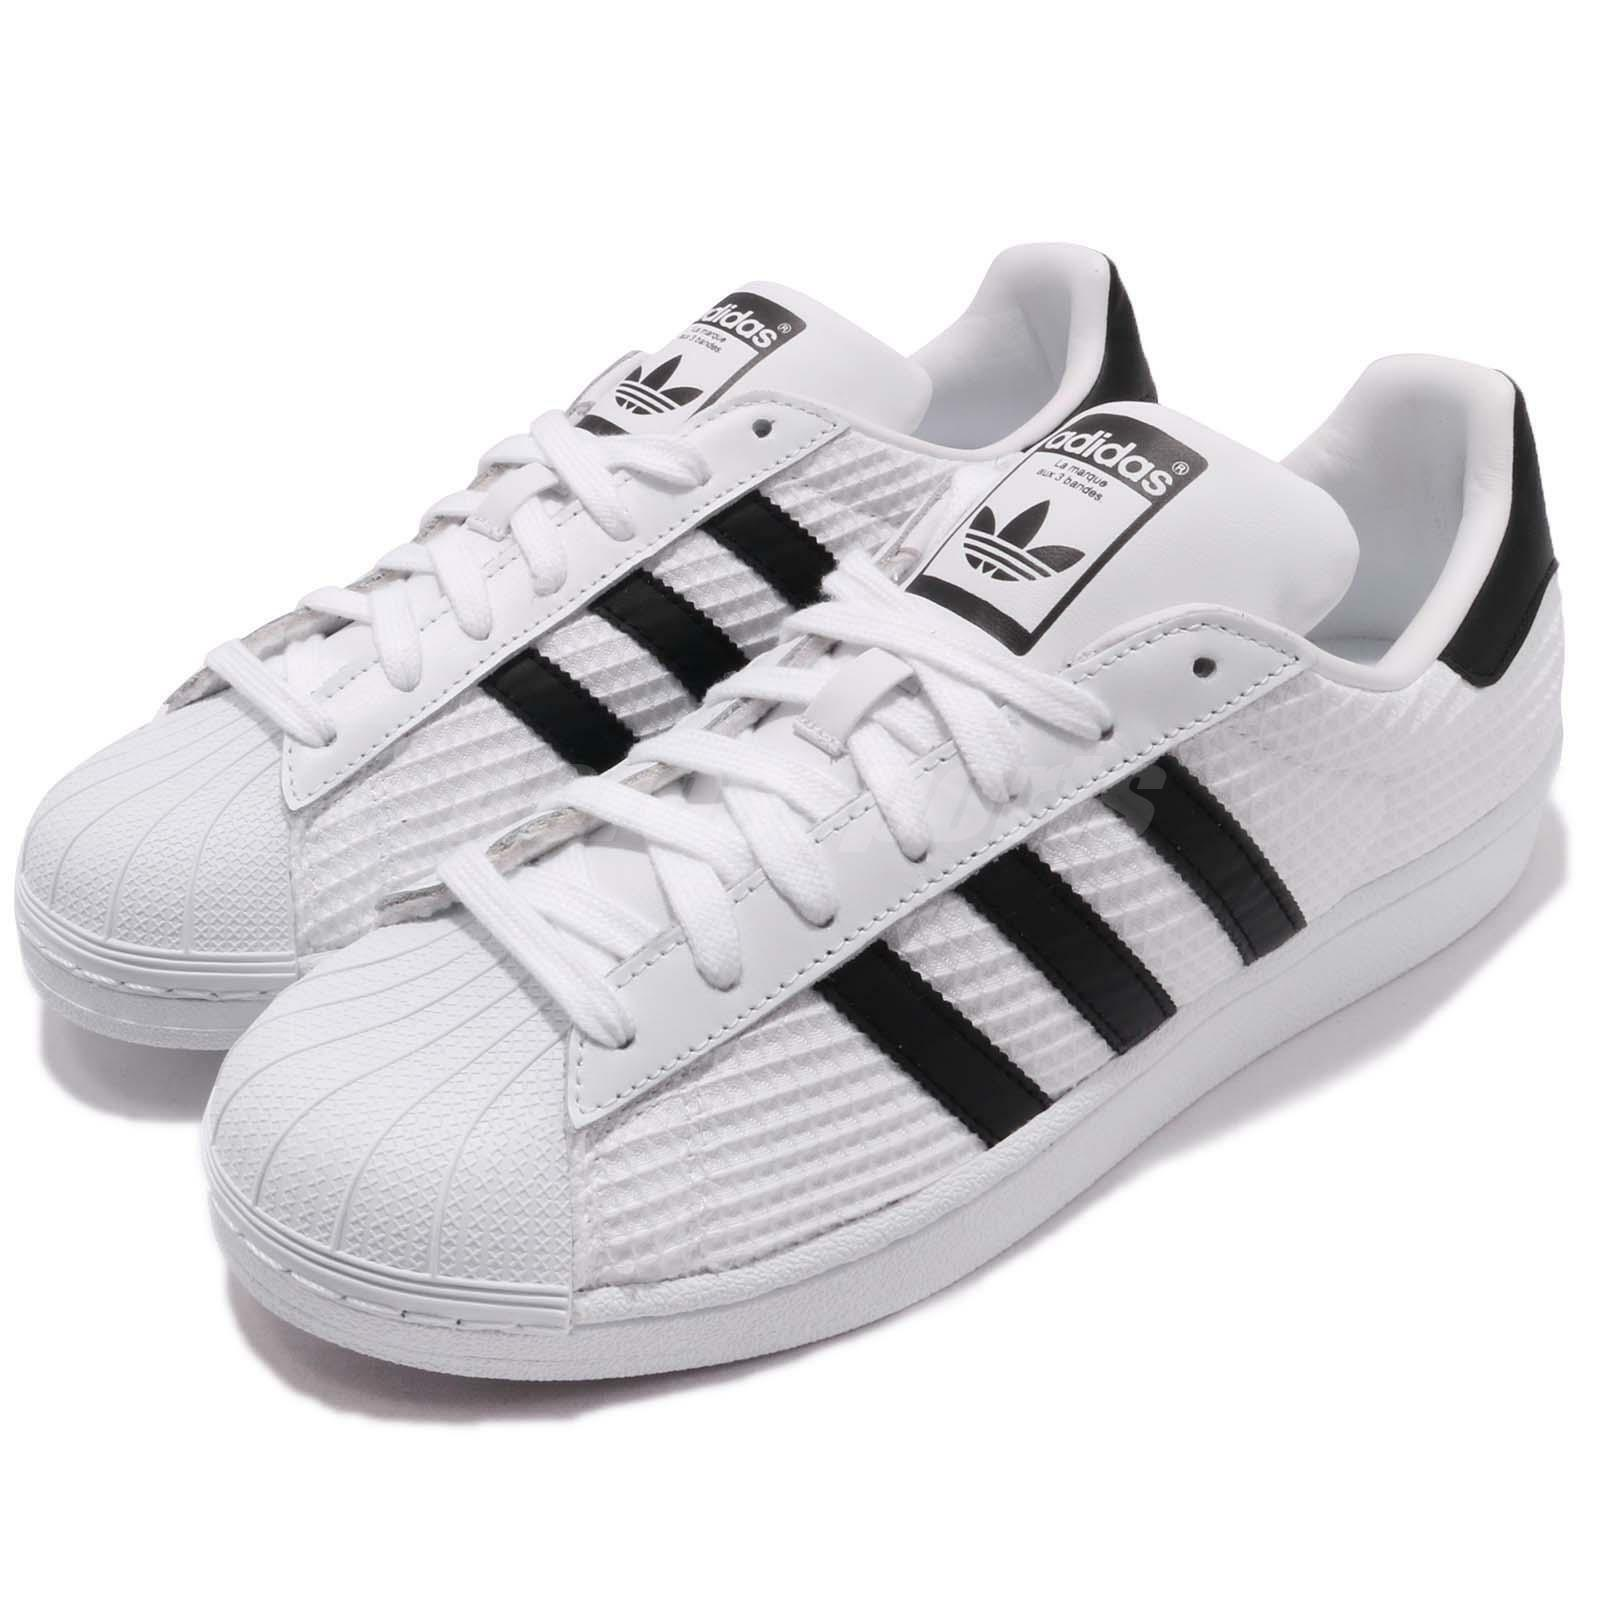 adidas Originals Superstar Footwear blanc Core noir homme Casual chaussures CM8077